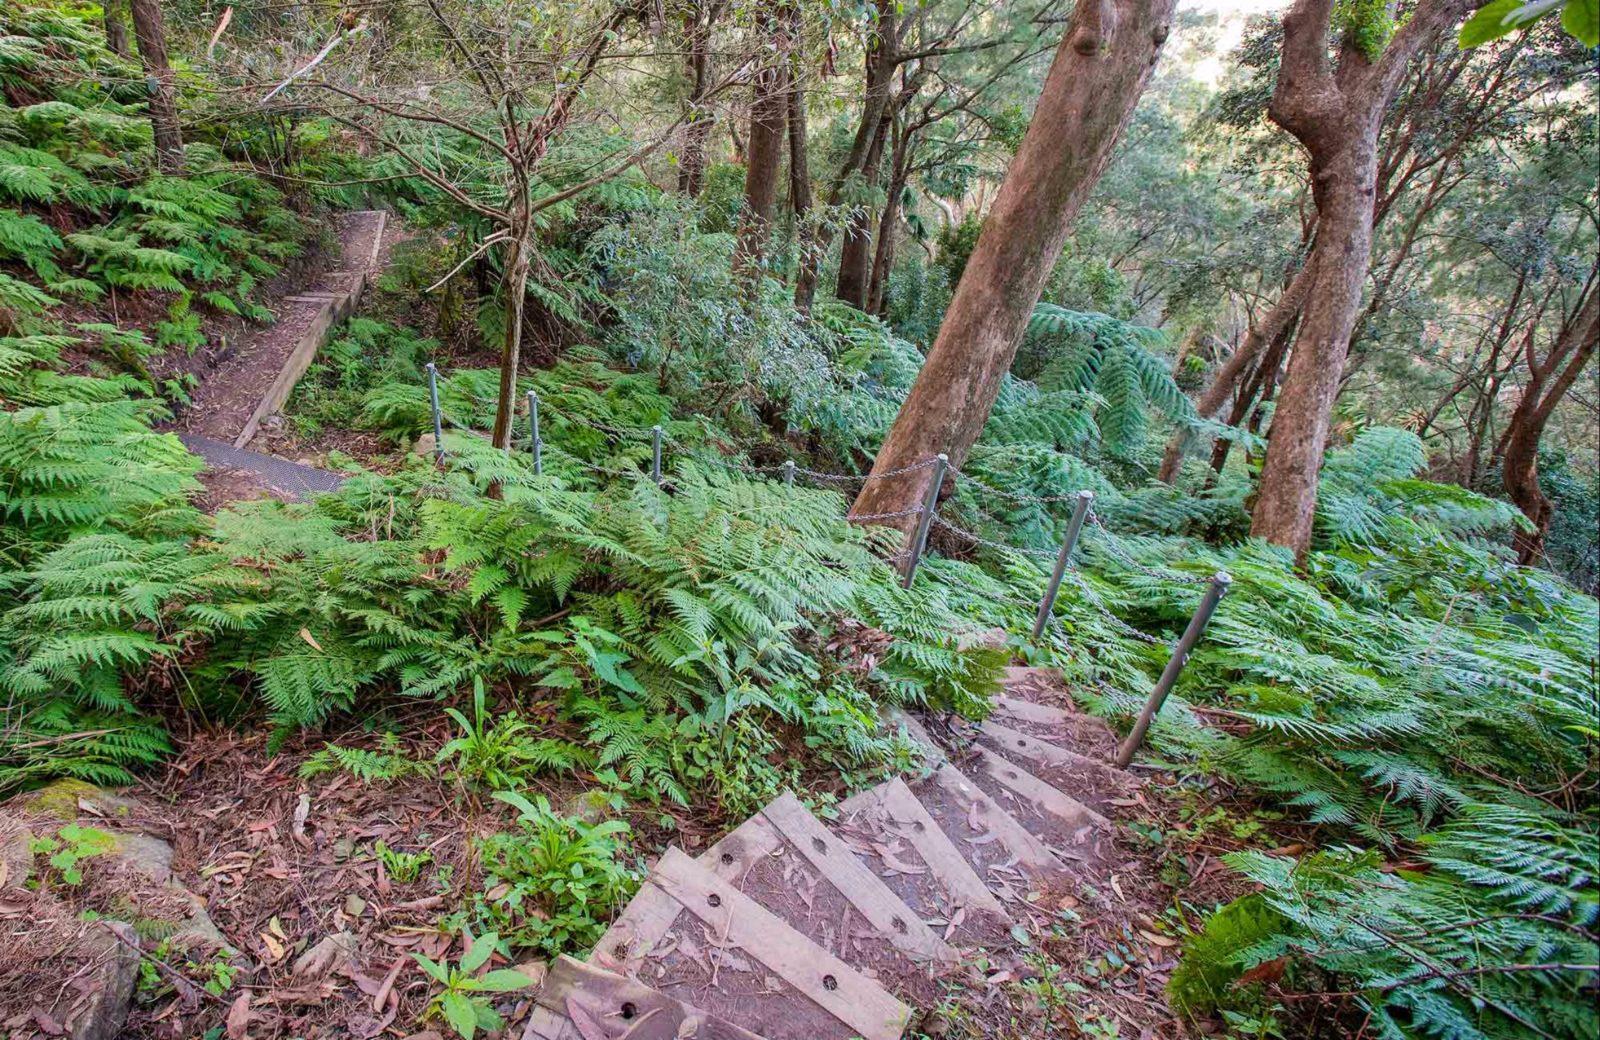 Sublime Point walking track, Illawarra Escarpment State Conservation Area. Photo: Nick Cubbin